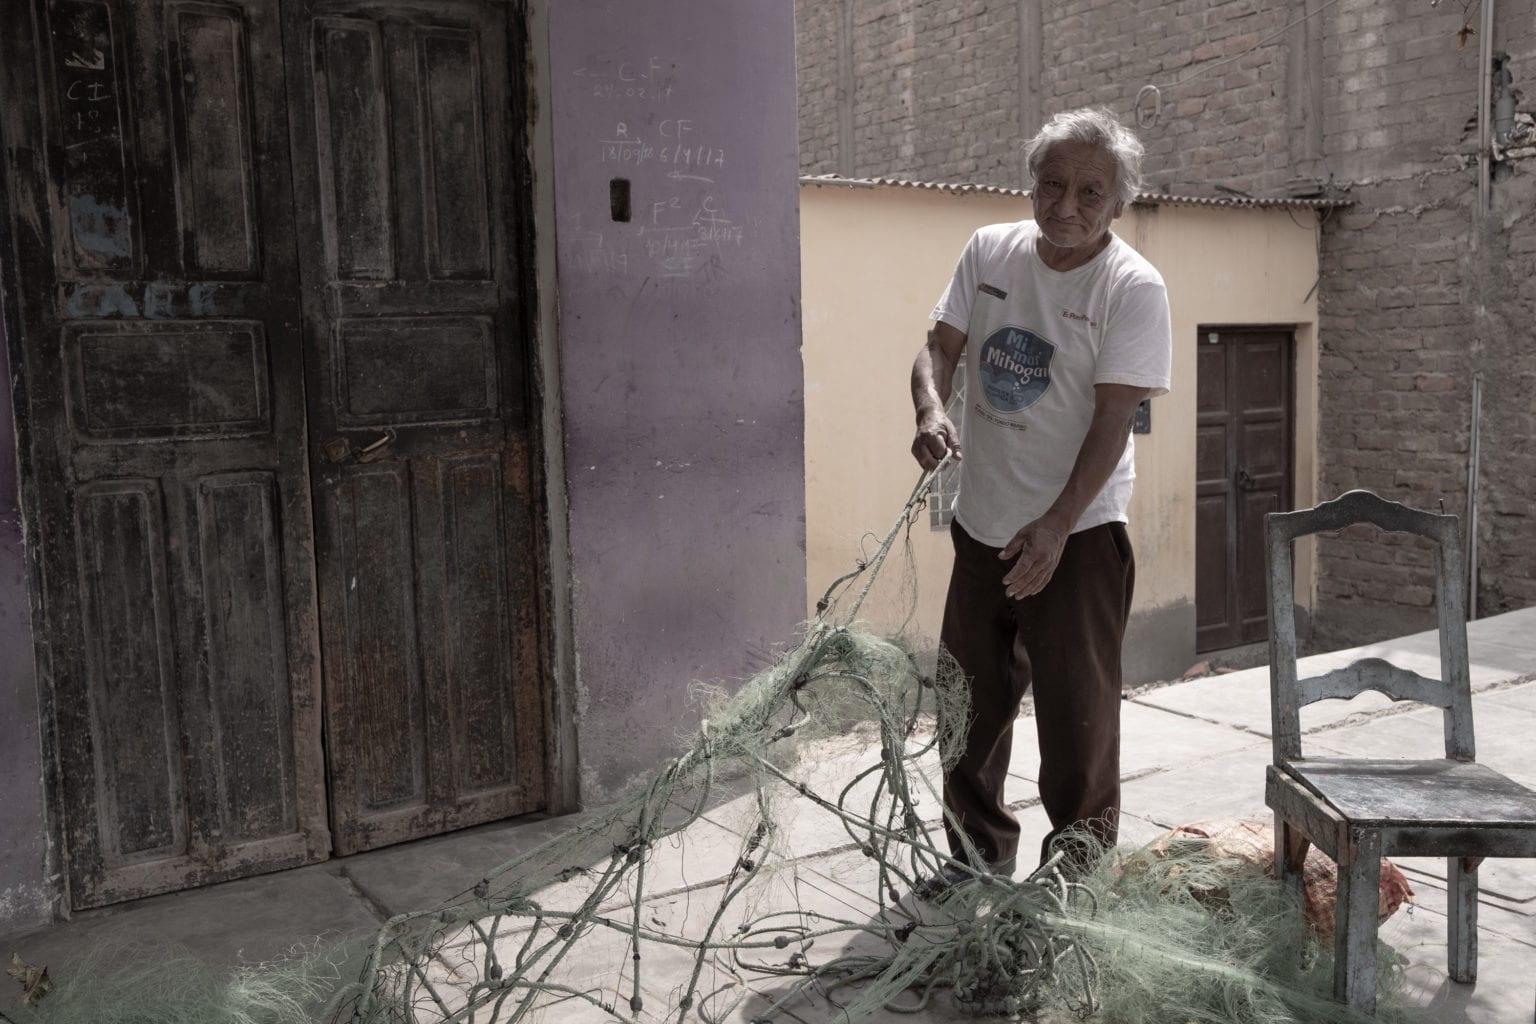 Edmundo Aparicio Fermani fisker ikke til fiskefabrikkerne, men til det lokale marked. Edmundo er bekymret over forureningen fra de store fiskemelsfabrikker, da det slår fiskene ihjel og går ud over fiskernes indtjening.